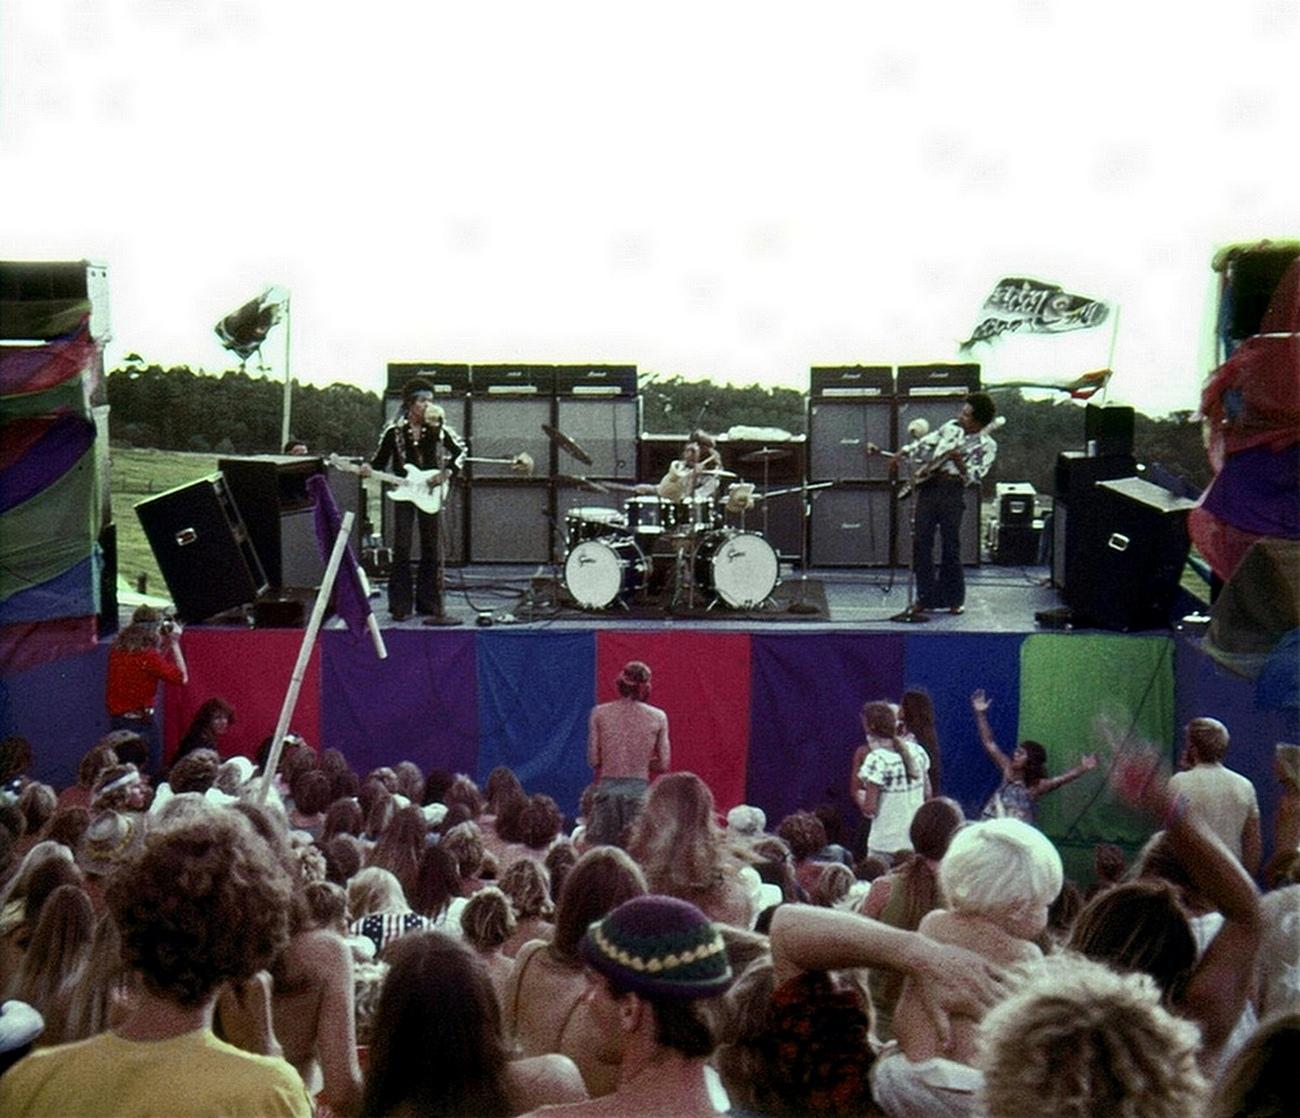 Maui (Haleakala Crater) : 30 juillet 1970 [Second concert] F813a7f5041d6ed4ff71fd3563a346e2